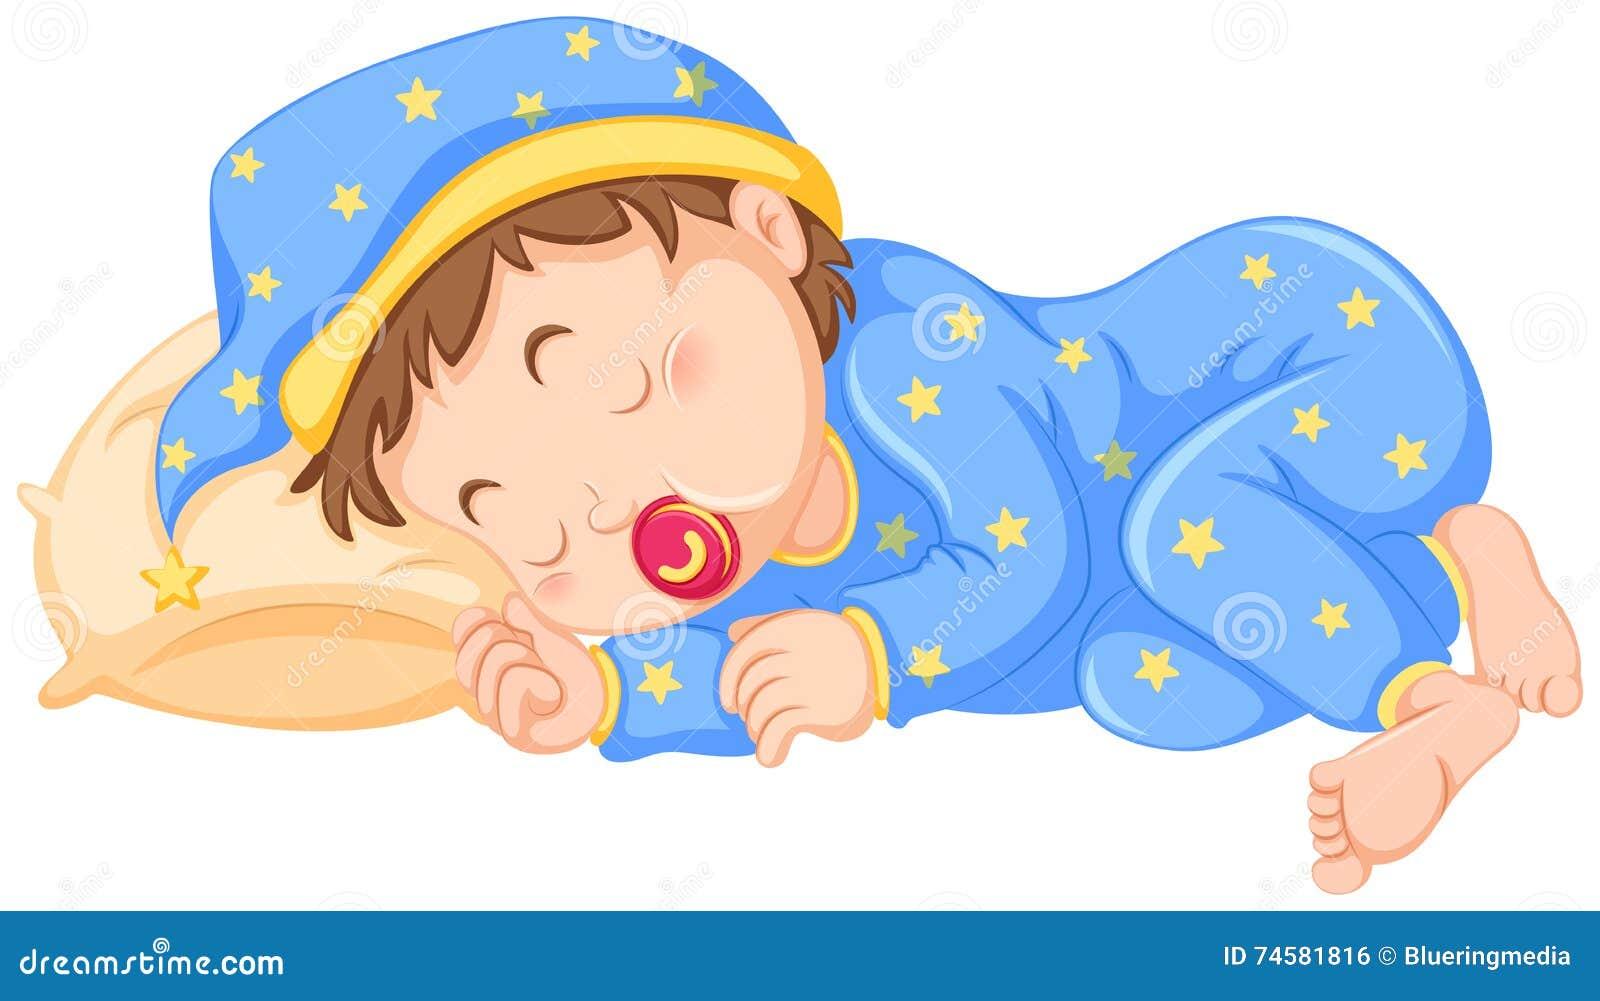 Baby boy sleeping stock vector. Illustration of drawing